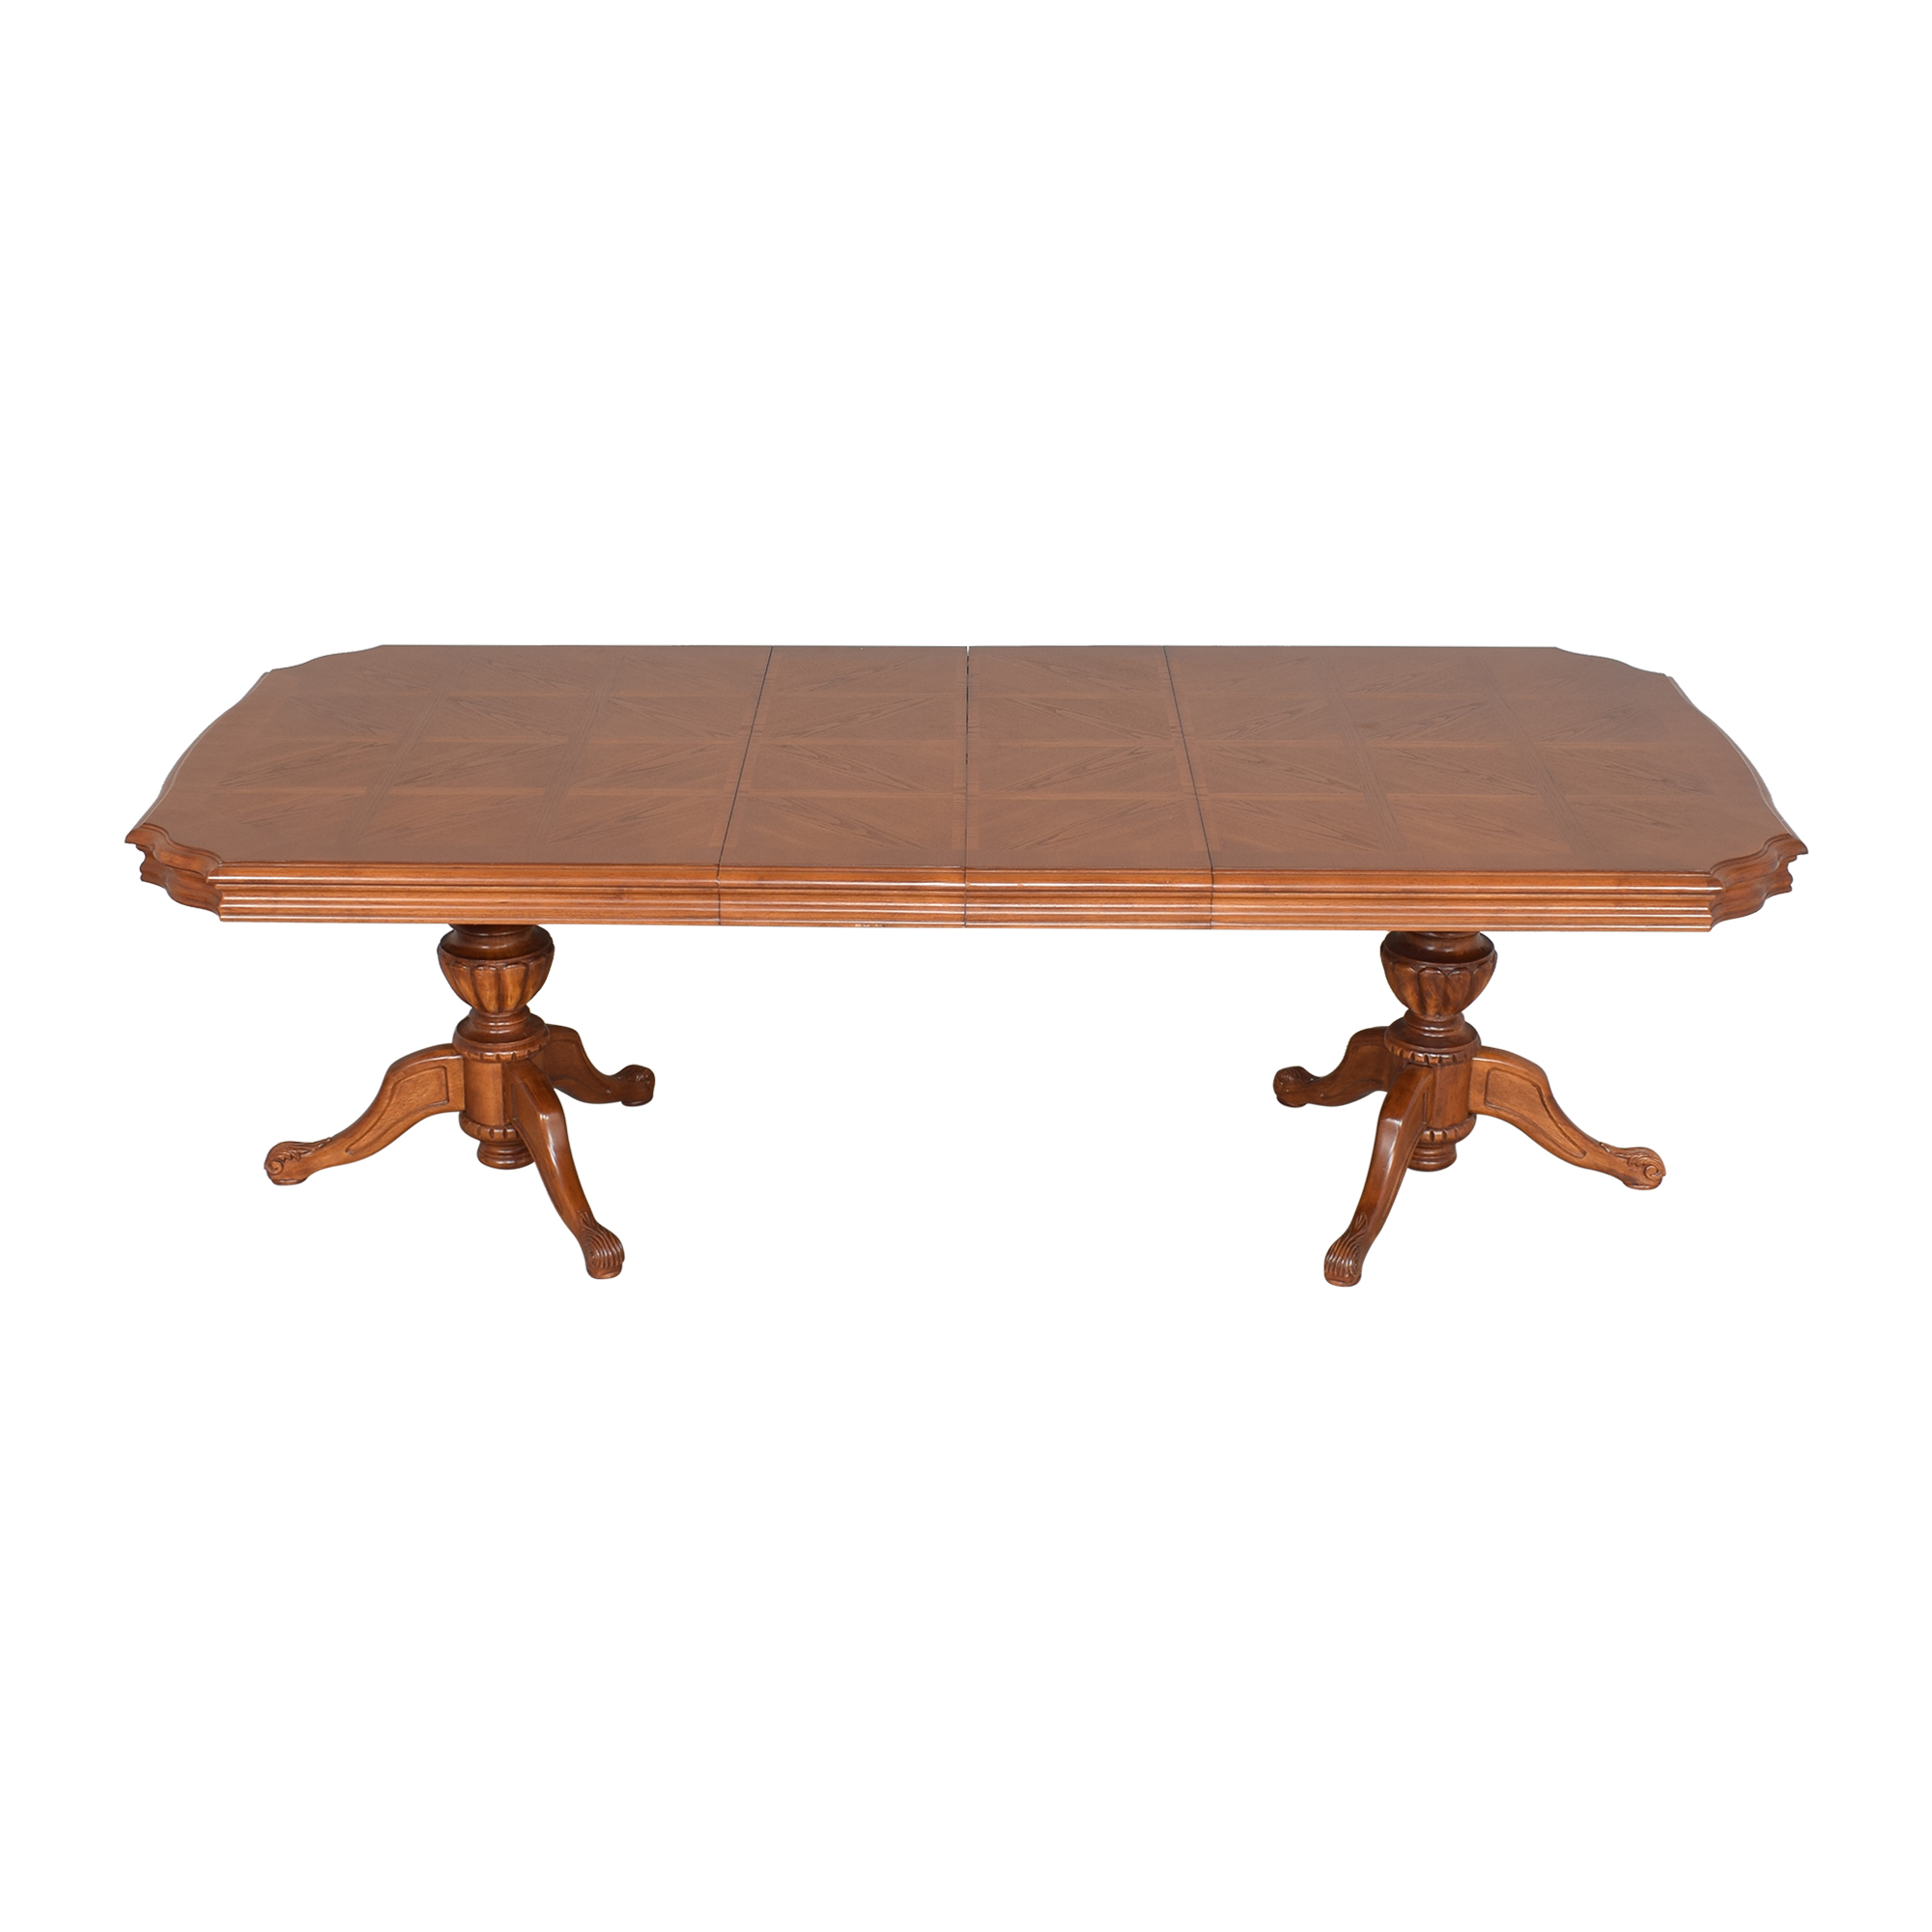 North Carolina Furniture Company North Carolina Furniture Extendable Dining Table dimensions